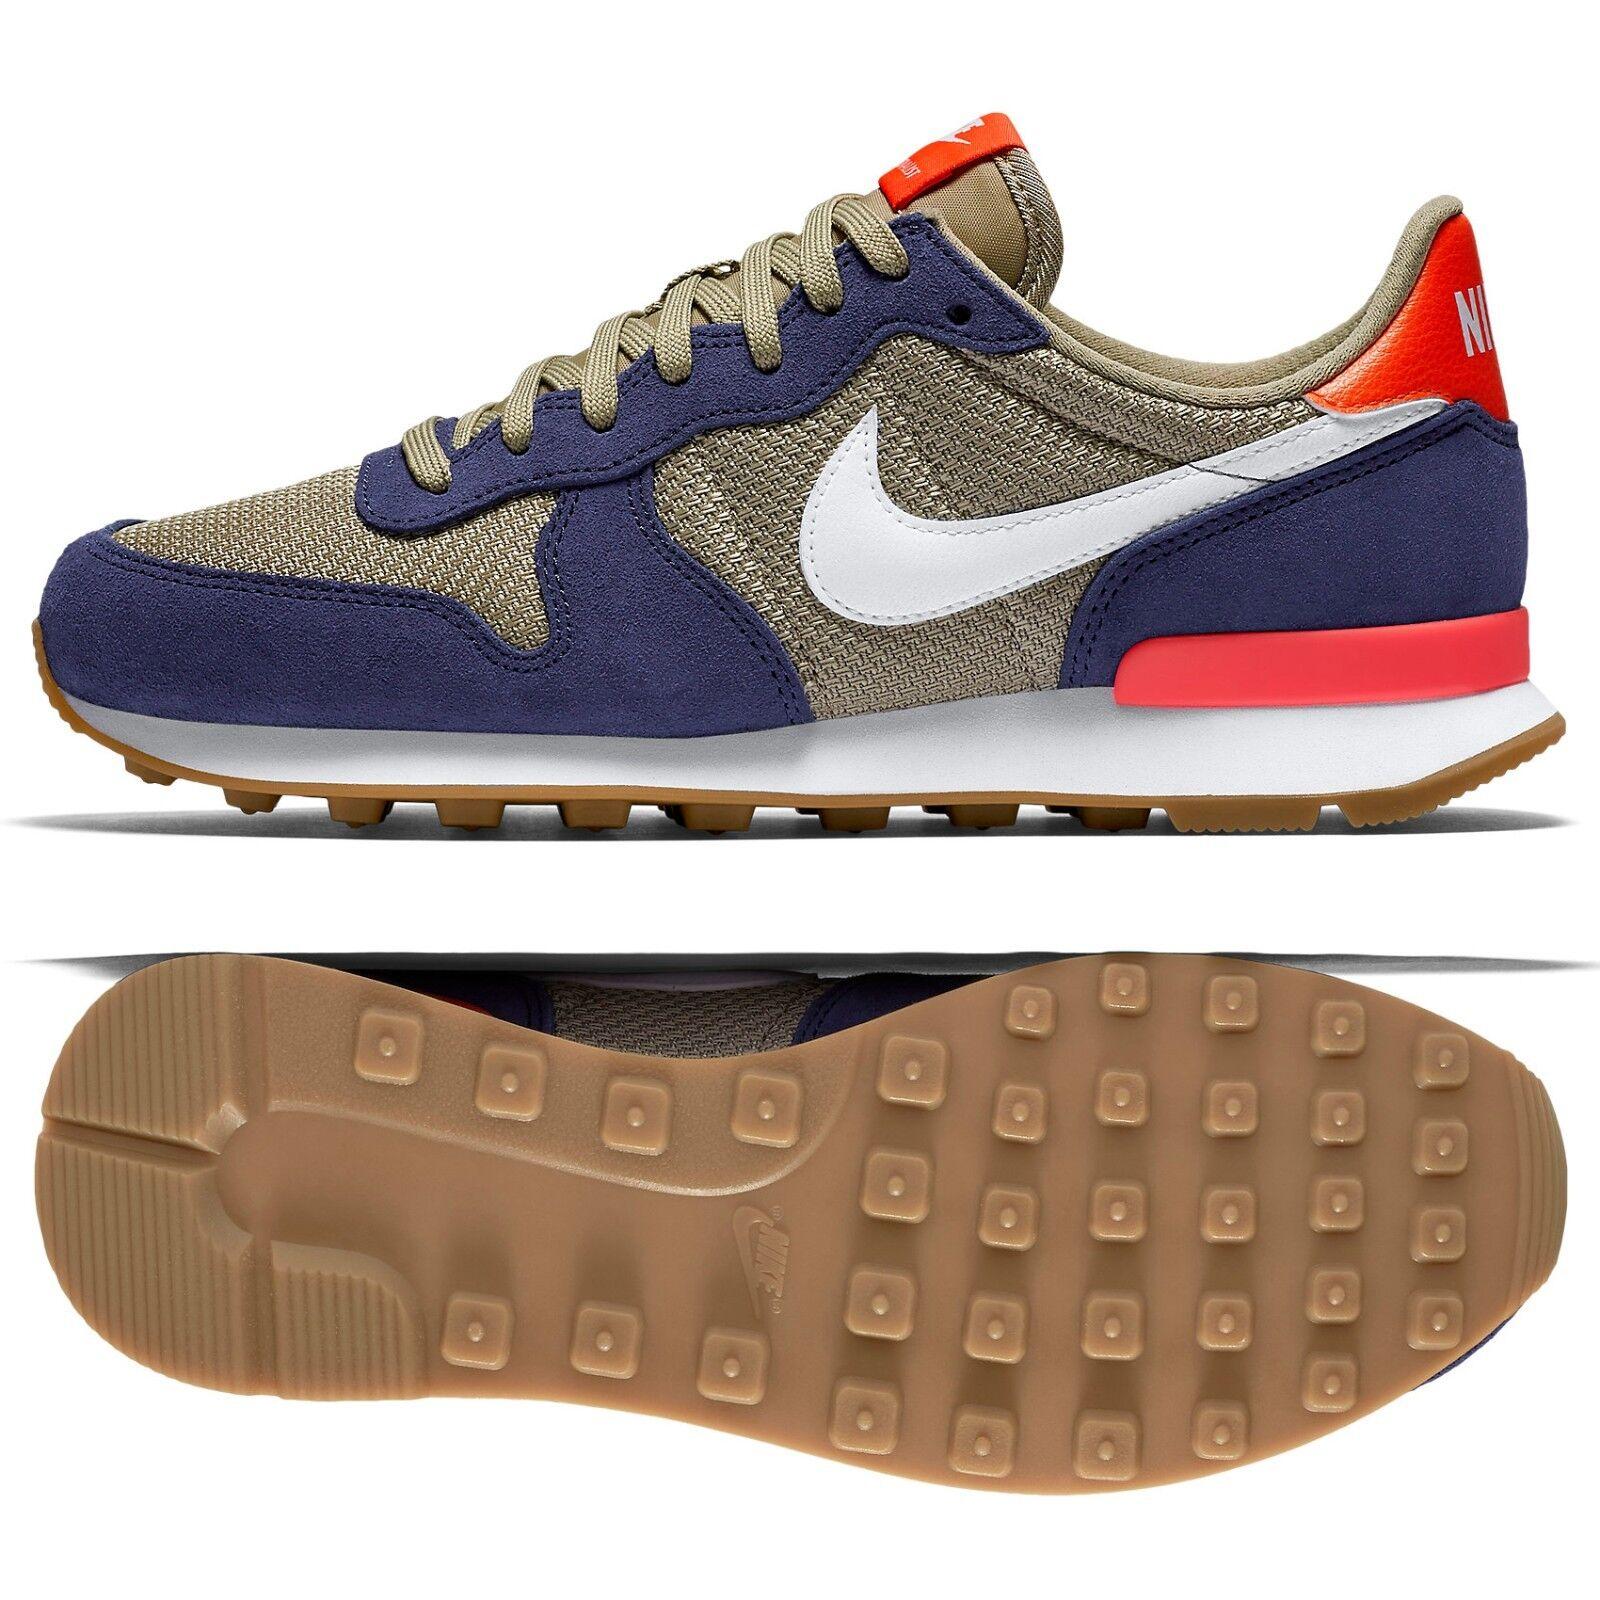 WMNS Nike Internationalist 828407-408 Loyal Blue/Bamboo/White Women's Shoes